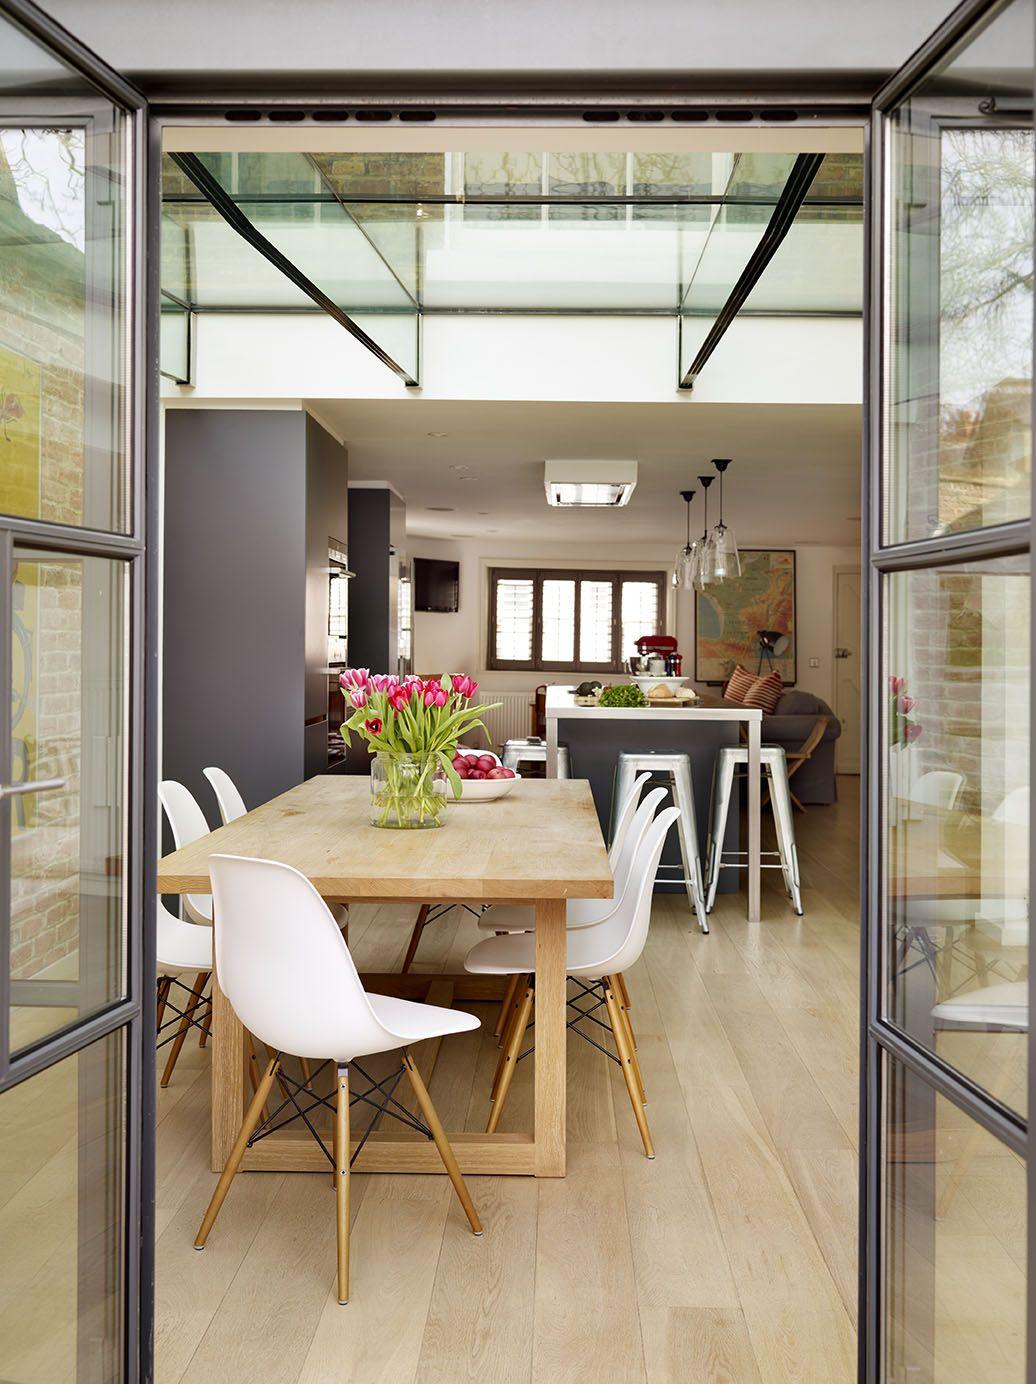 Best Roundhouse Bespoke Kitchen Furniture Matt Lacquer Urbo 400 x 300